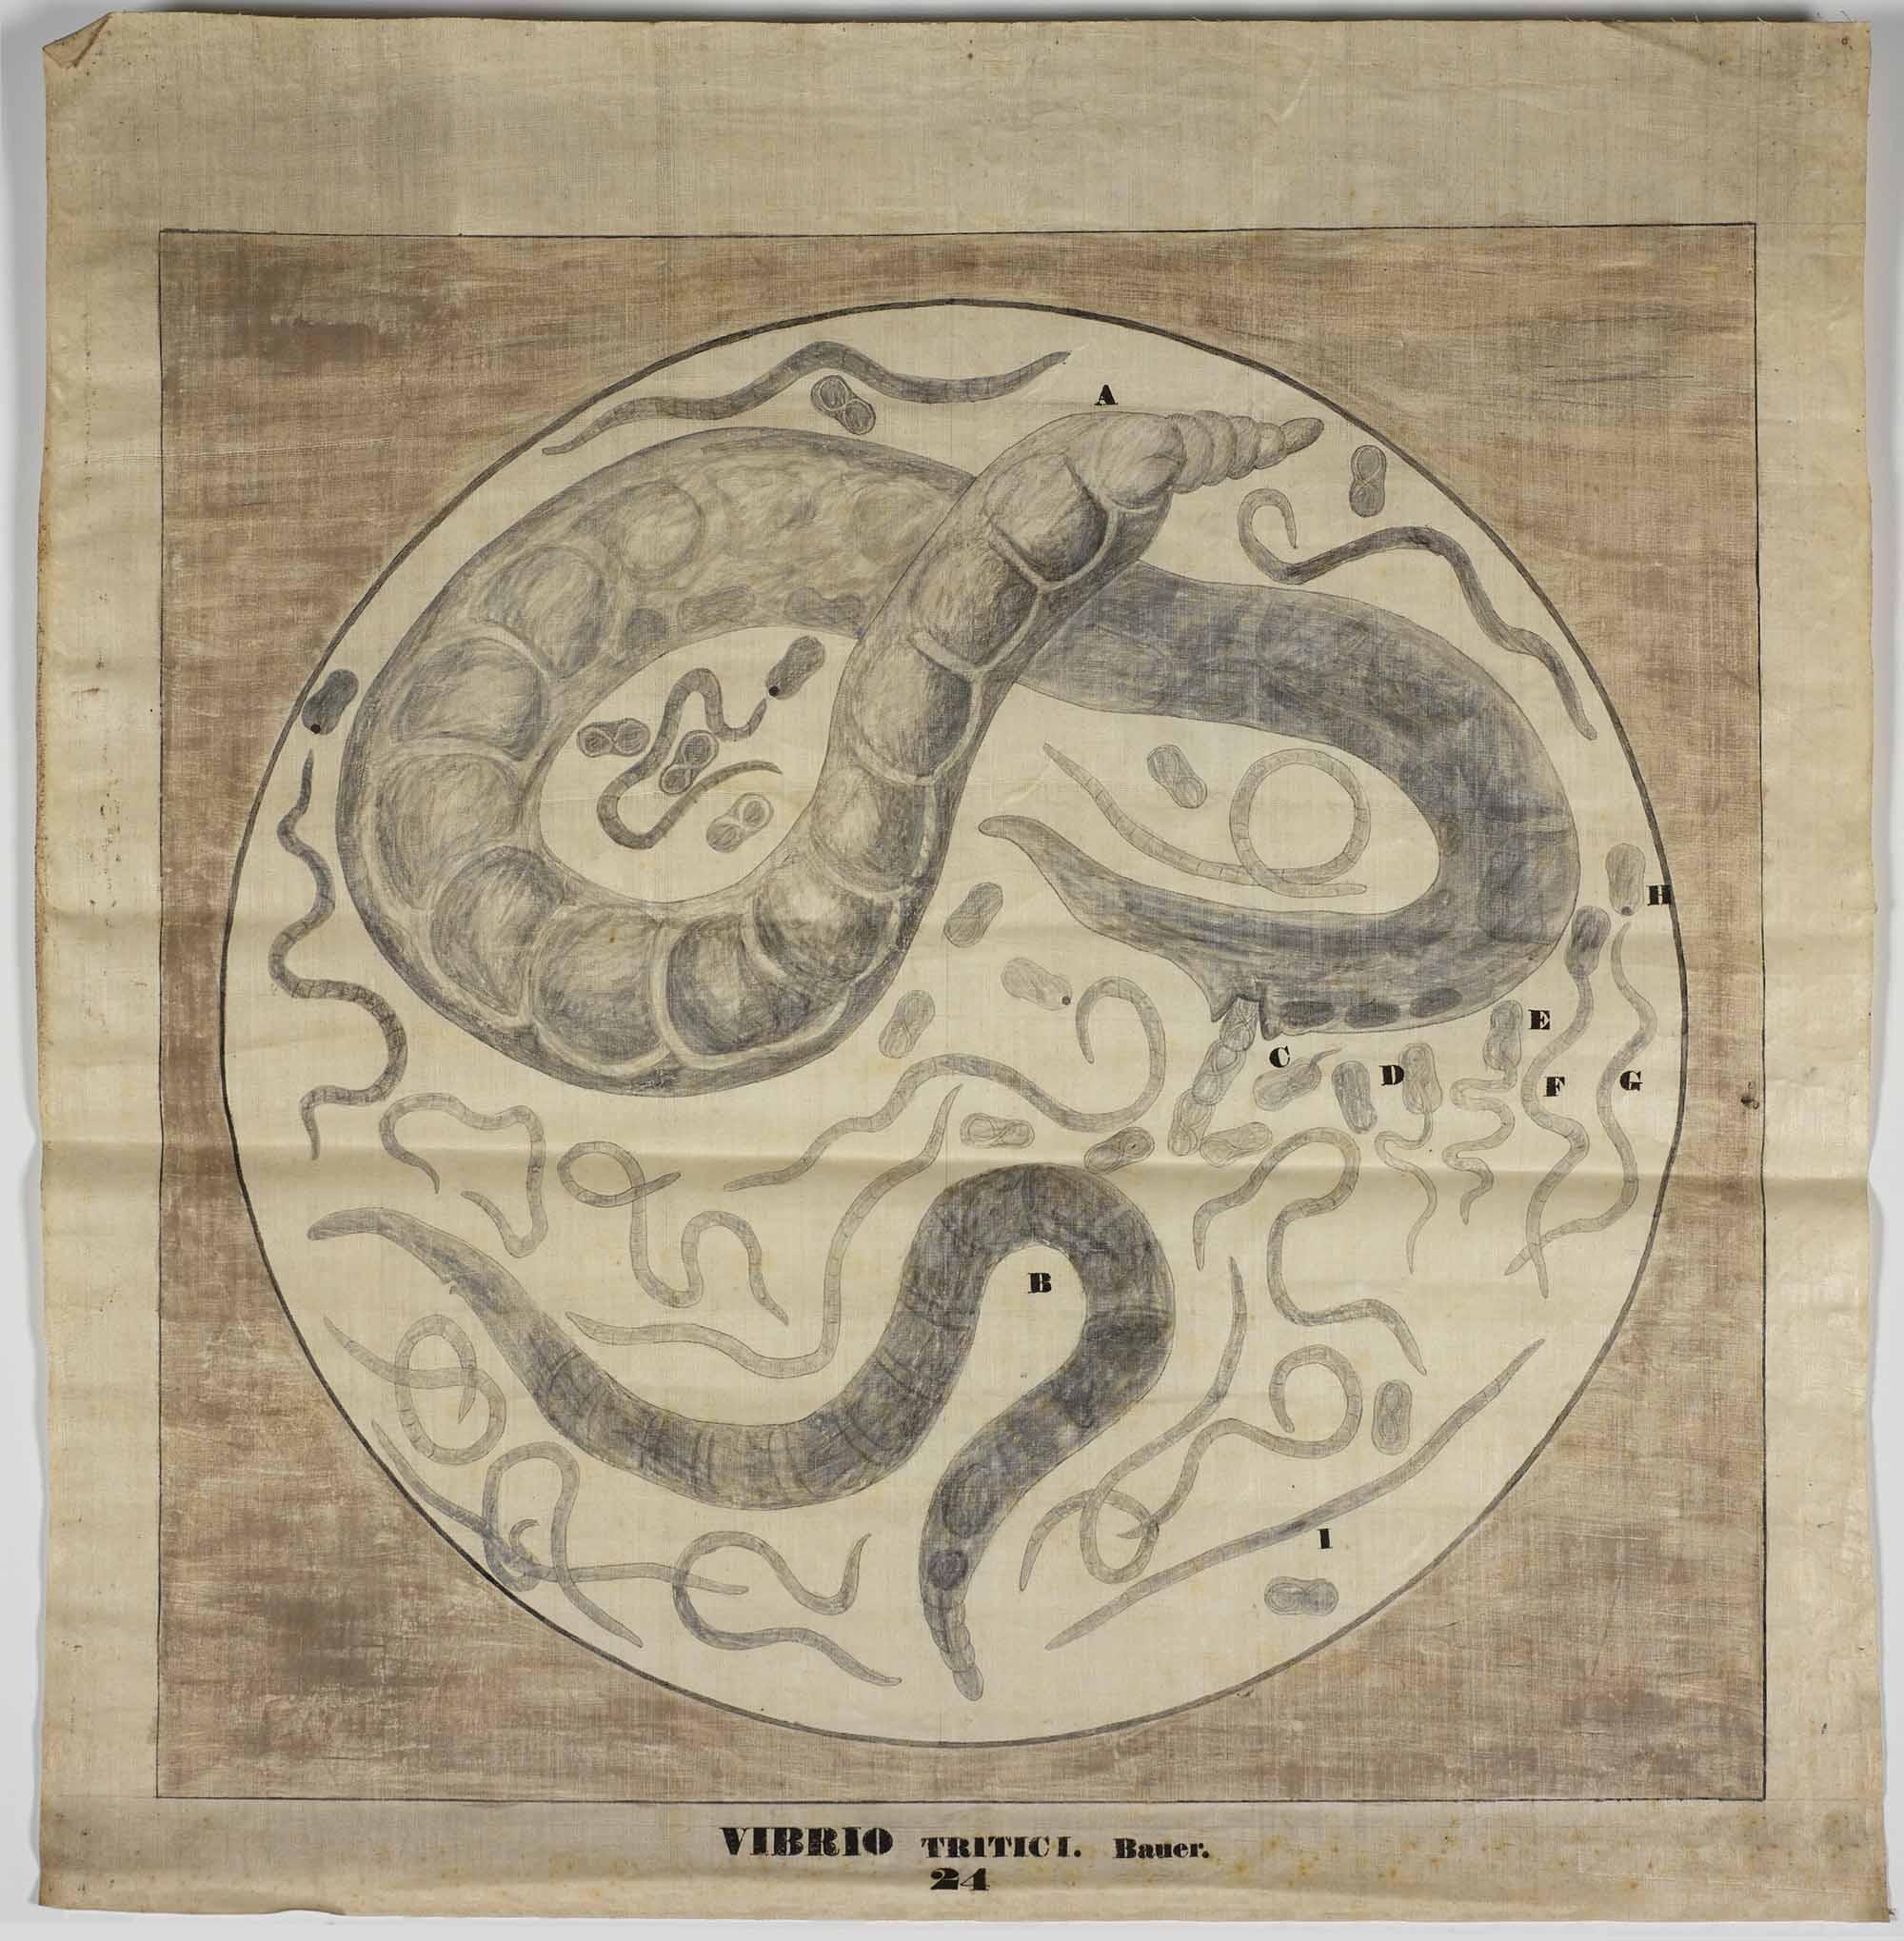 Vibrio tritici, [after Franz A. Bauer],  1821